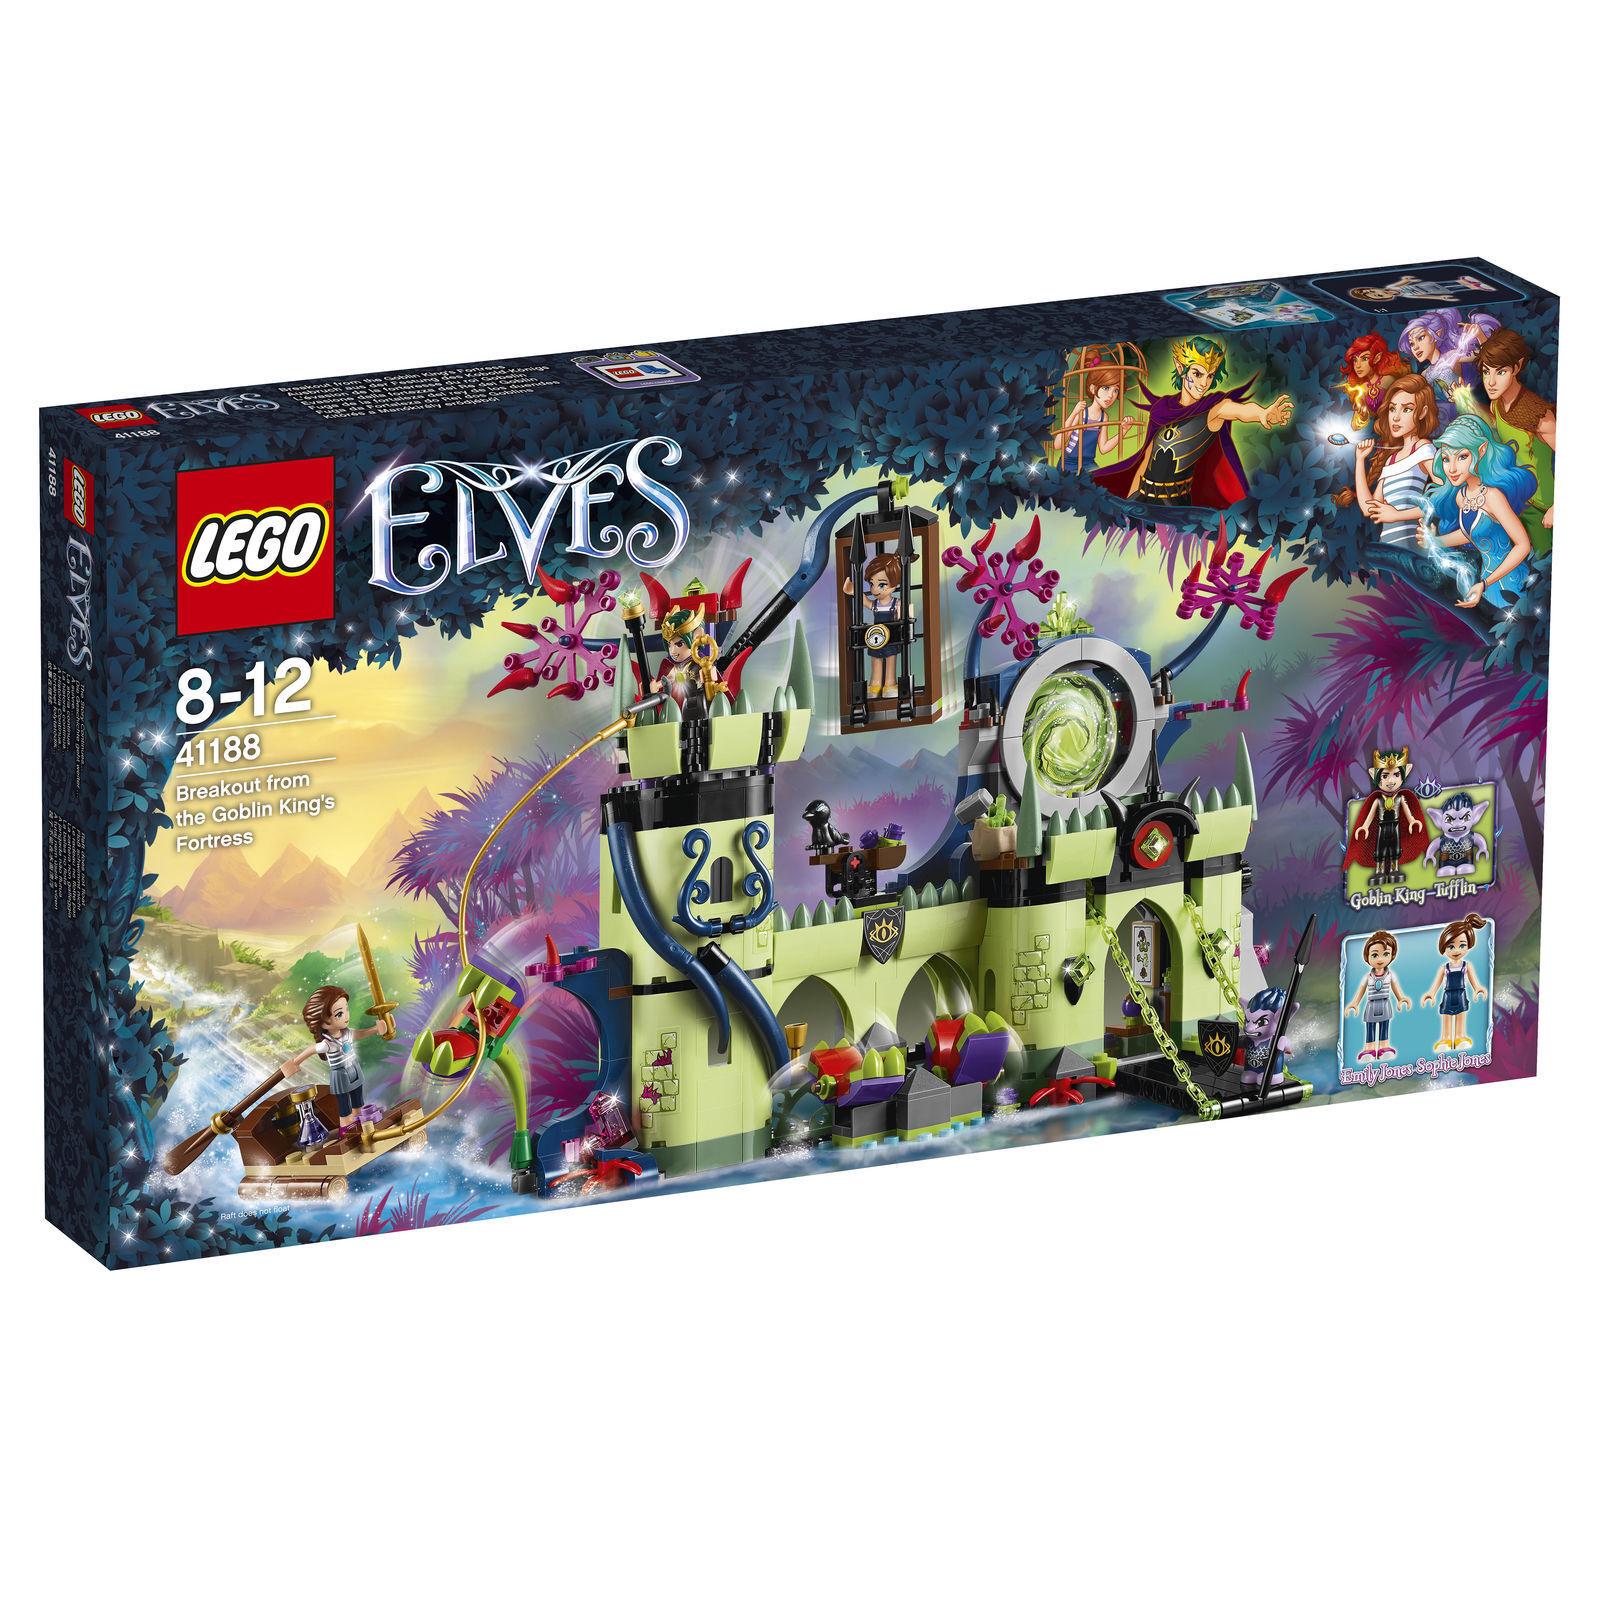 Lego Elves estallido de la fortaleza del Kobold-rey (41188) neu&ovp